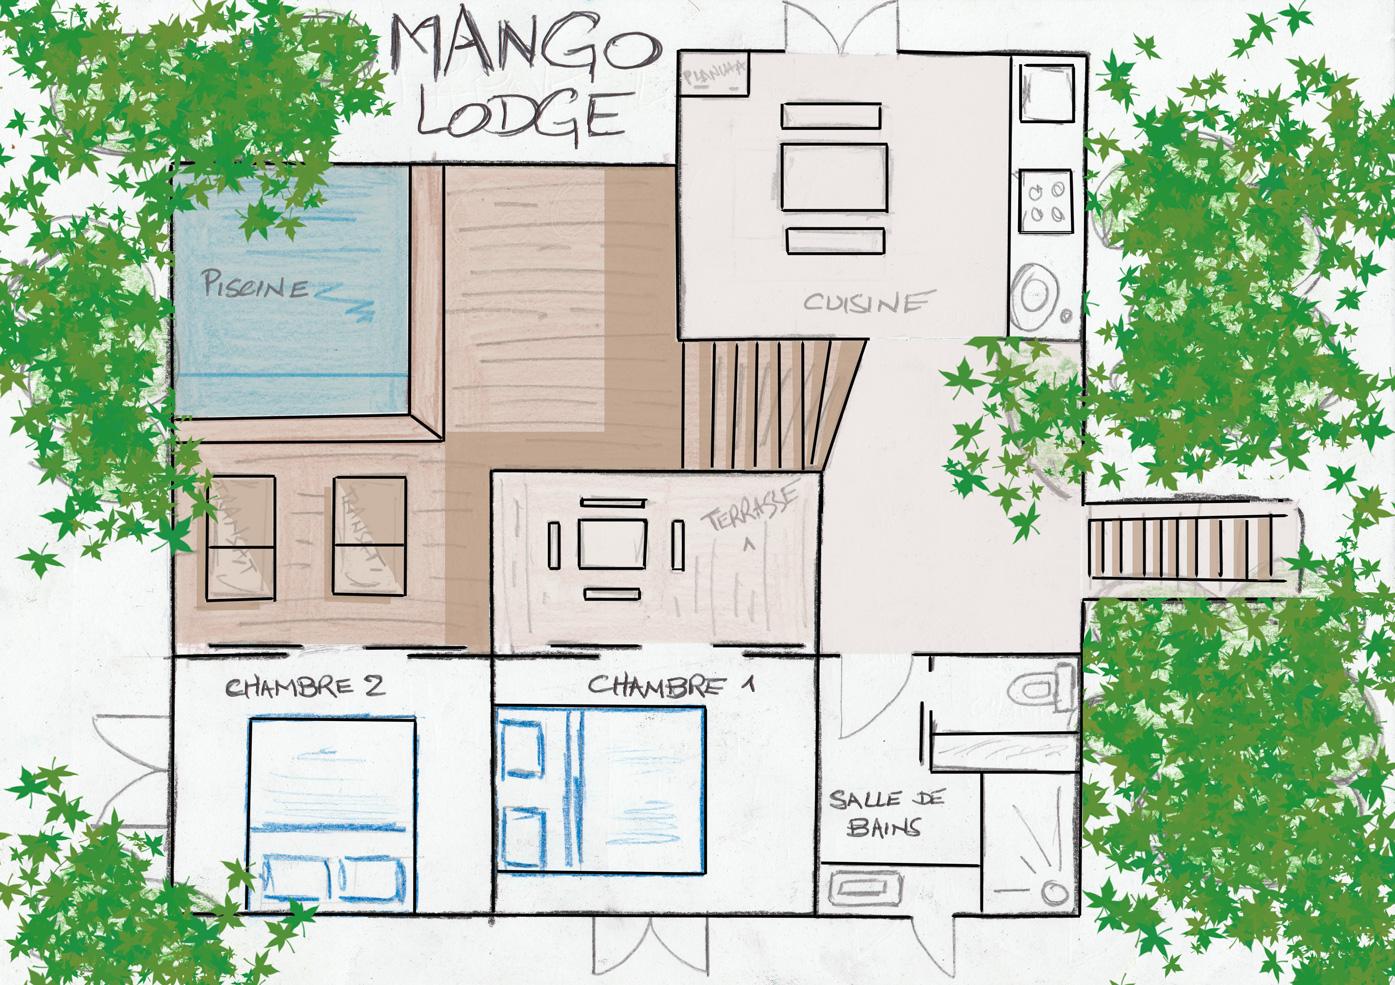 Nos Lodges Mango Lodge